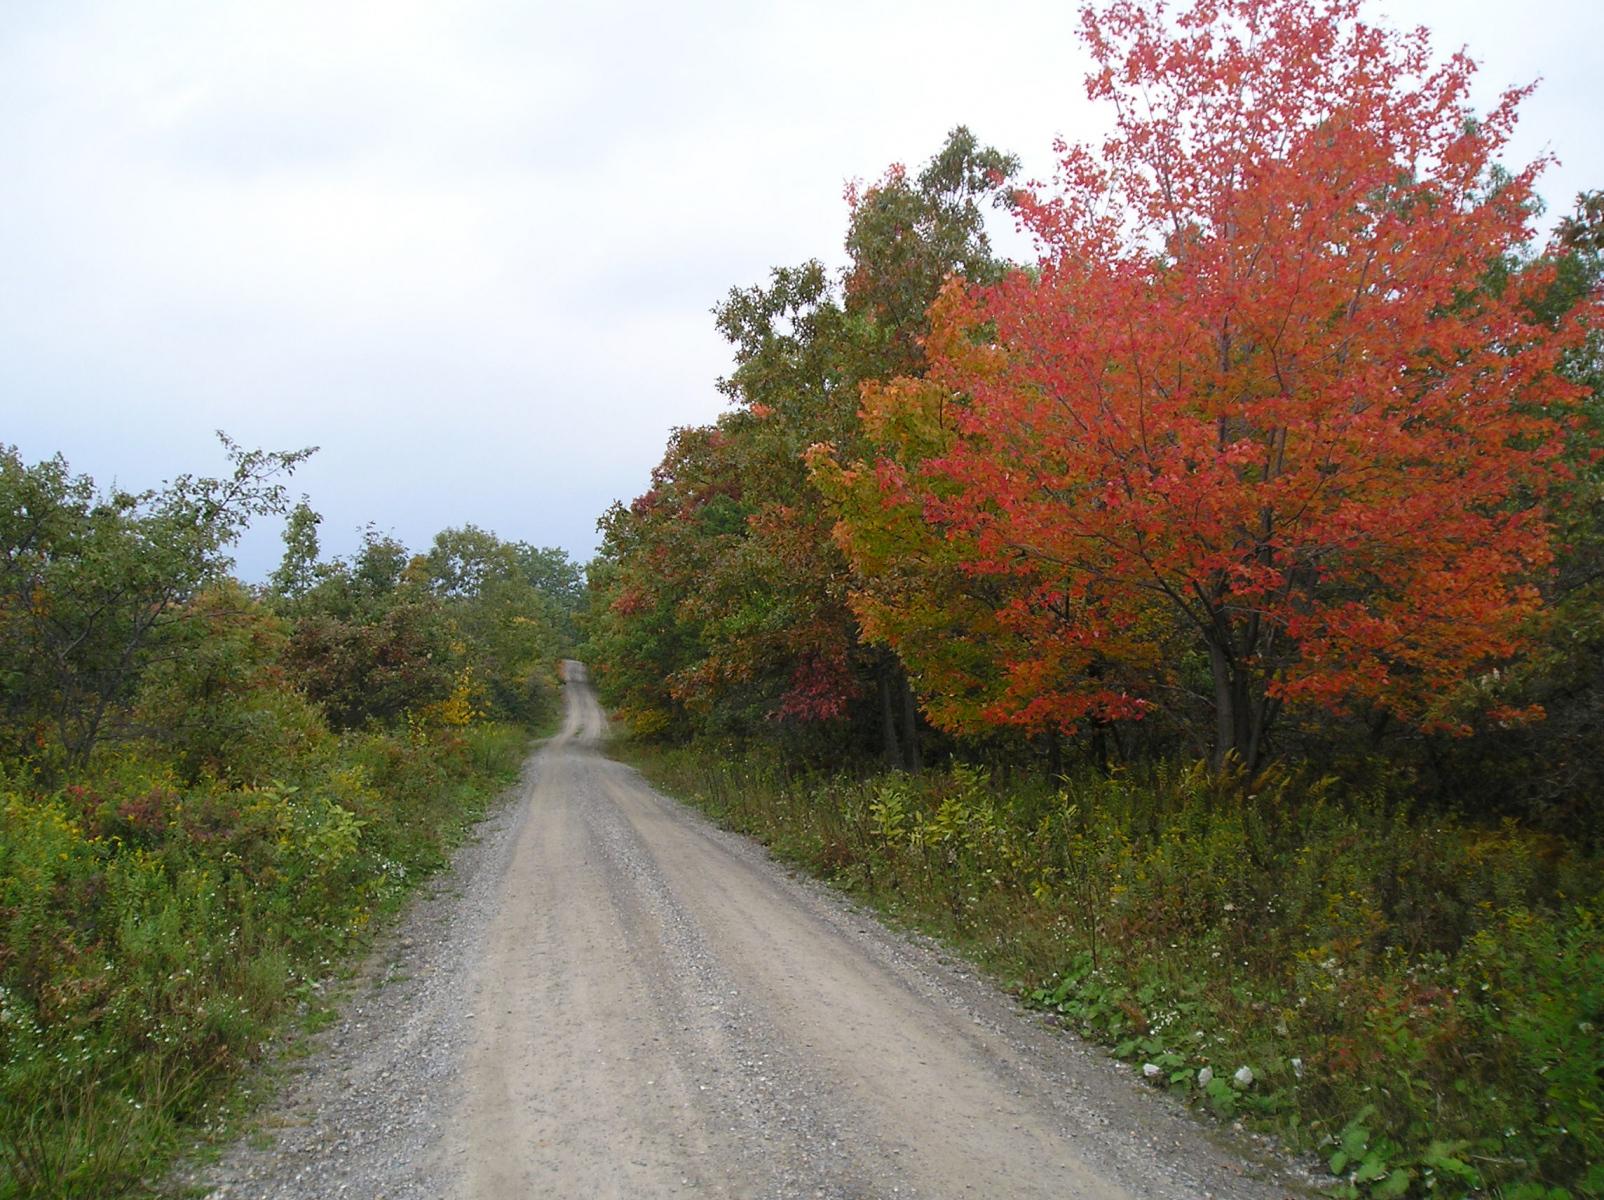 Chipmunk road